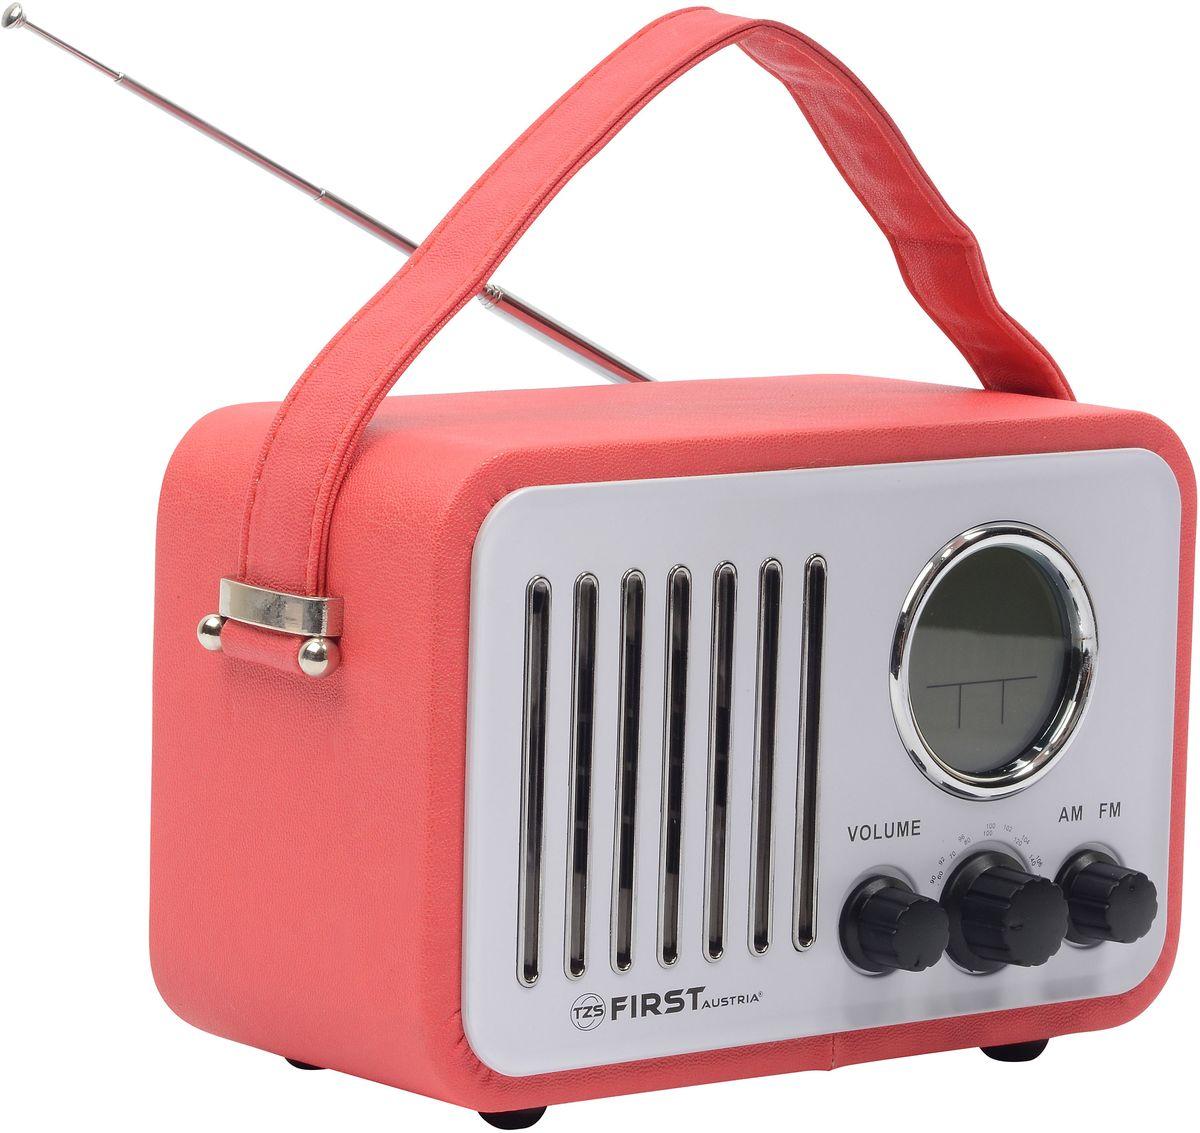 First FA-1908-1, Red радио-будильникFA-1908-1 RedРадиоприемник FIRST 1908-1 , AM/FM, 0.45 Вт, ЖК-диспл, часы, будильник, темп., AUX, AC/DC Red